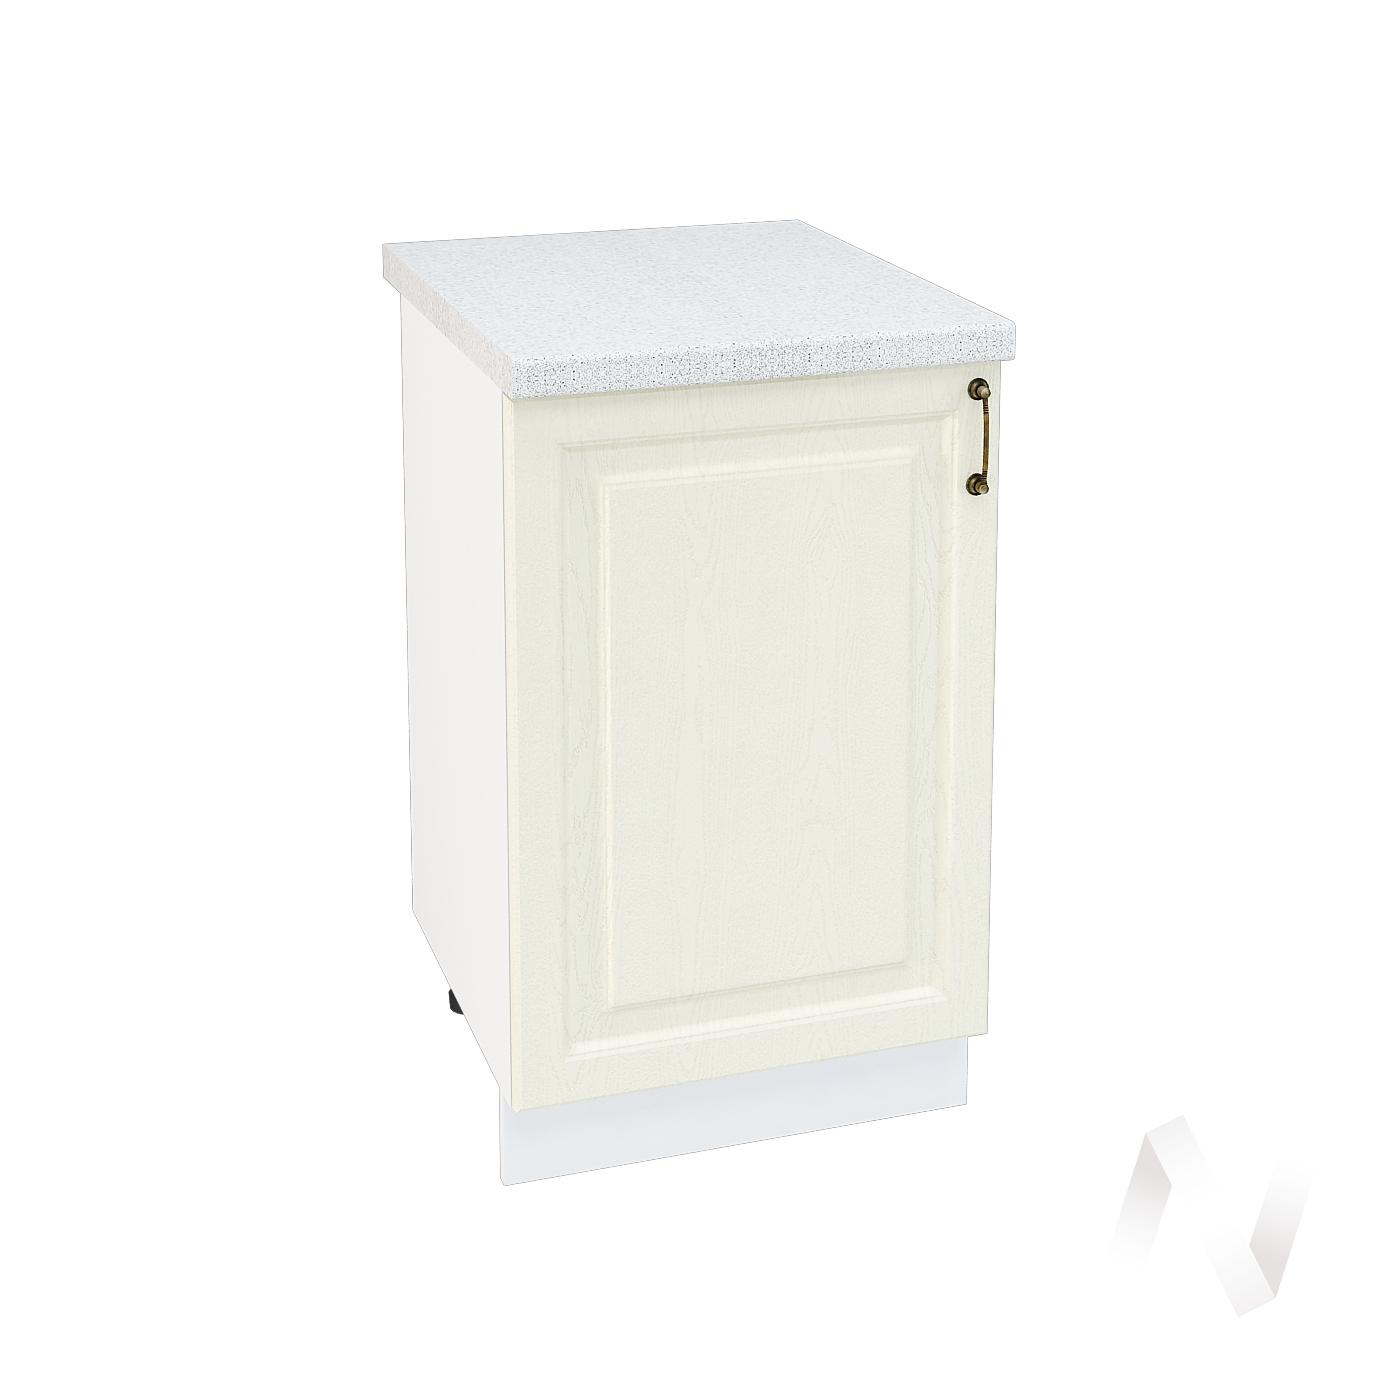 "Кухня ""Ницца"": Шкаф нижний 500, ШН 500 (Крем/корпус белый)"